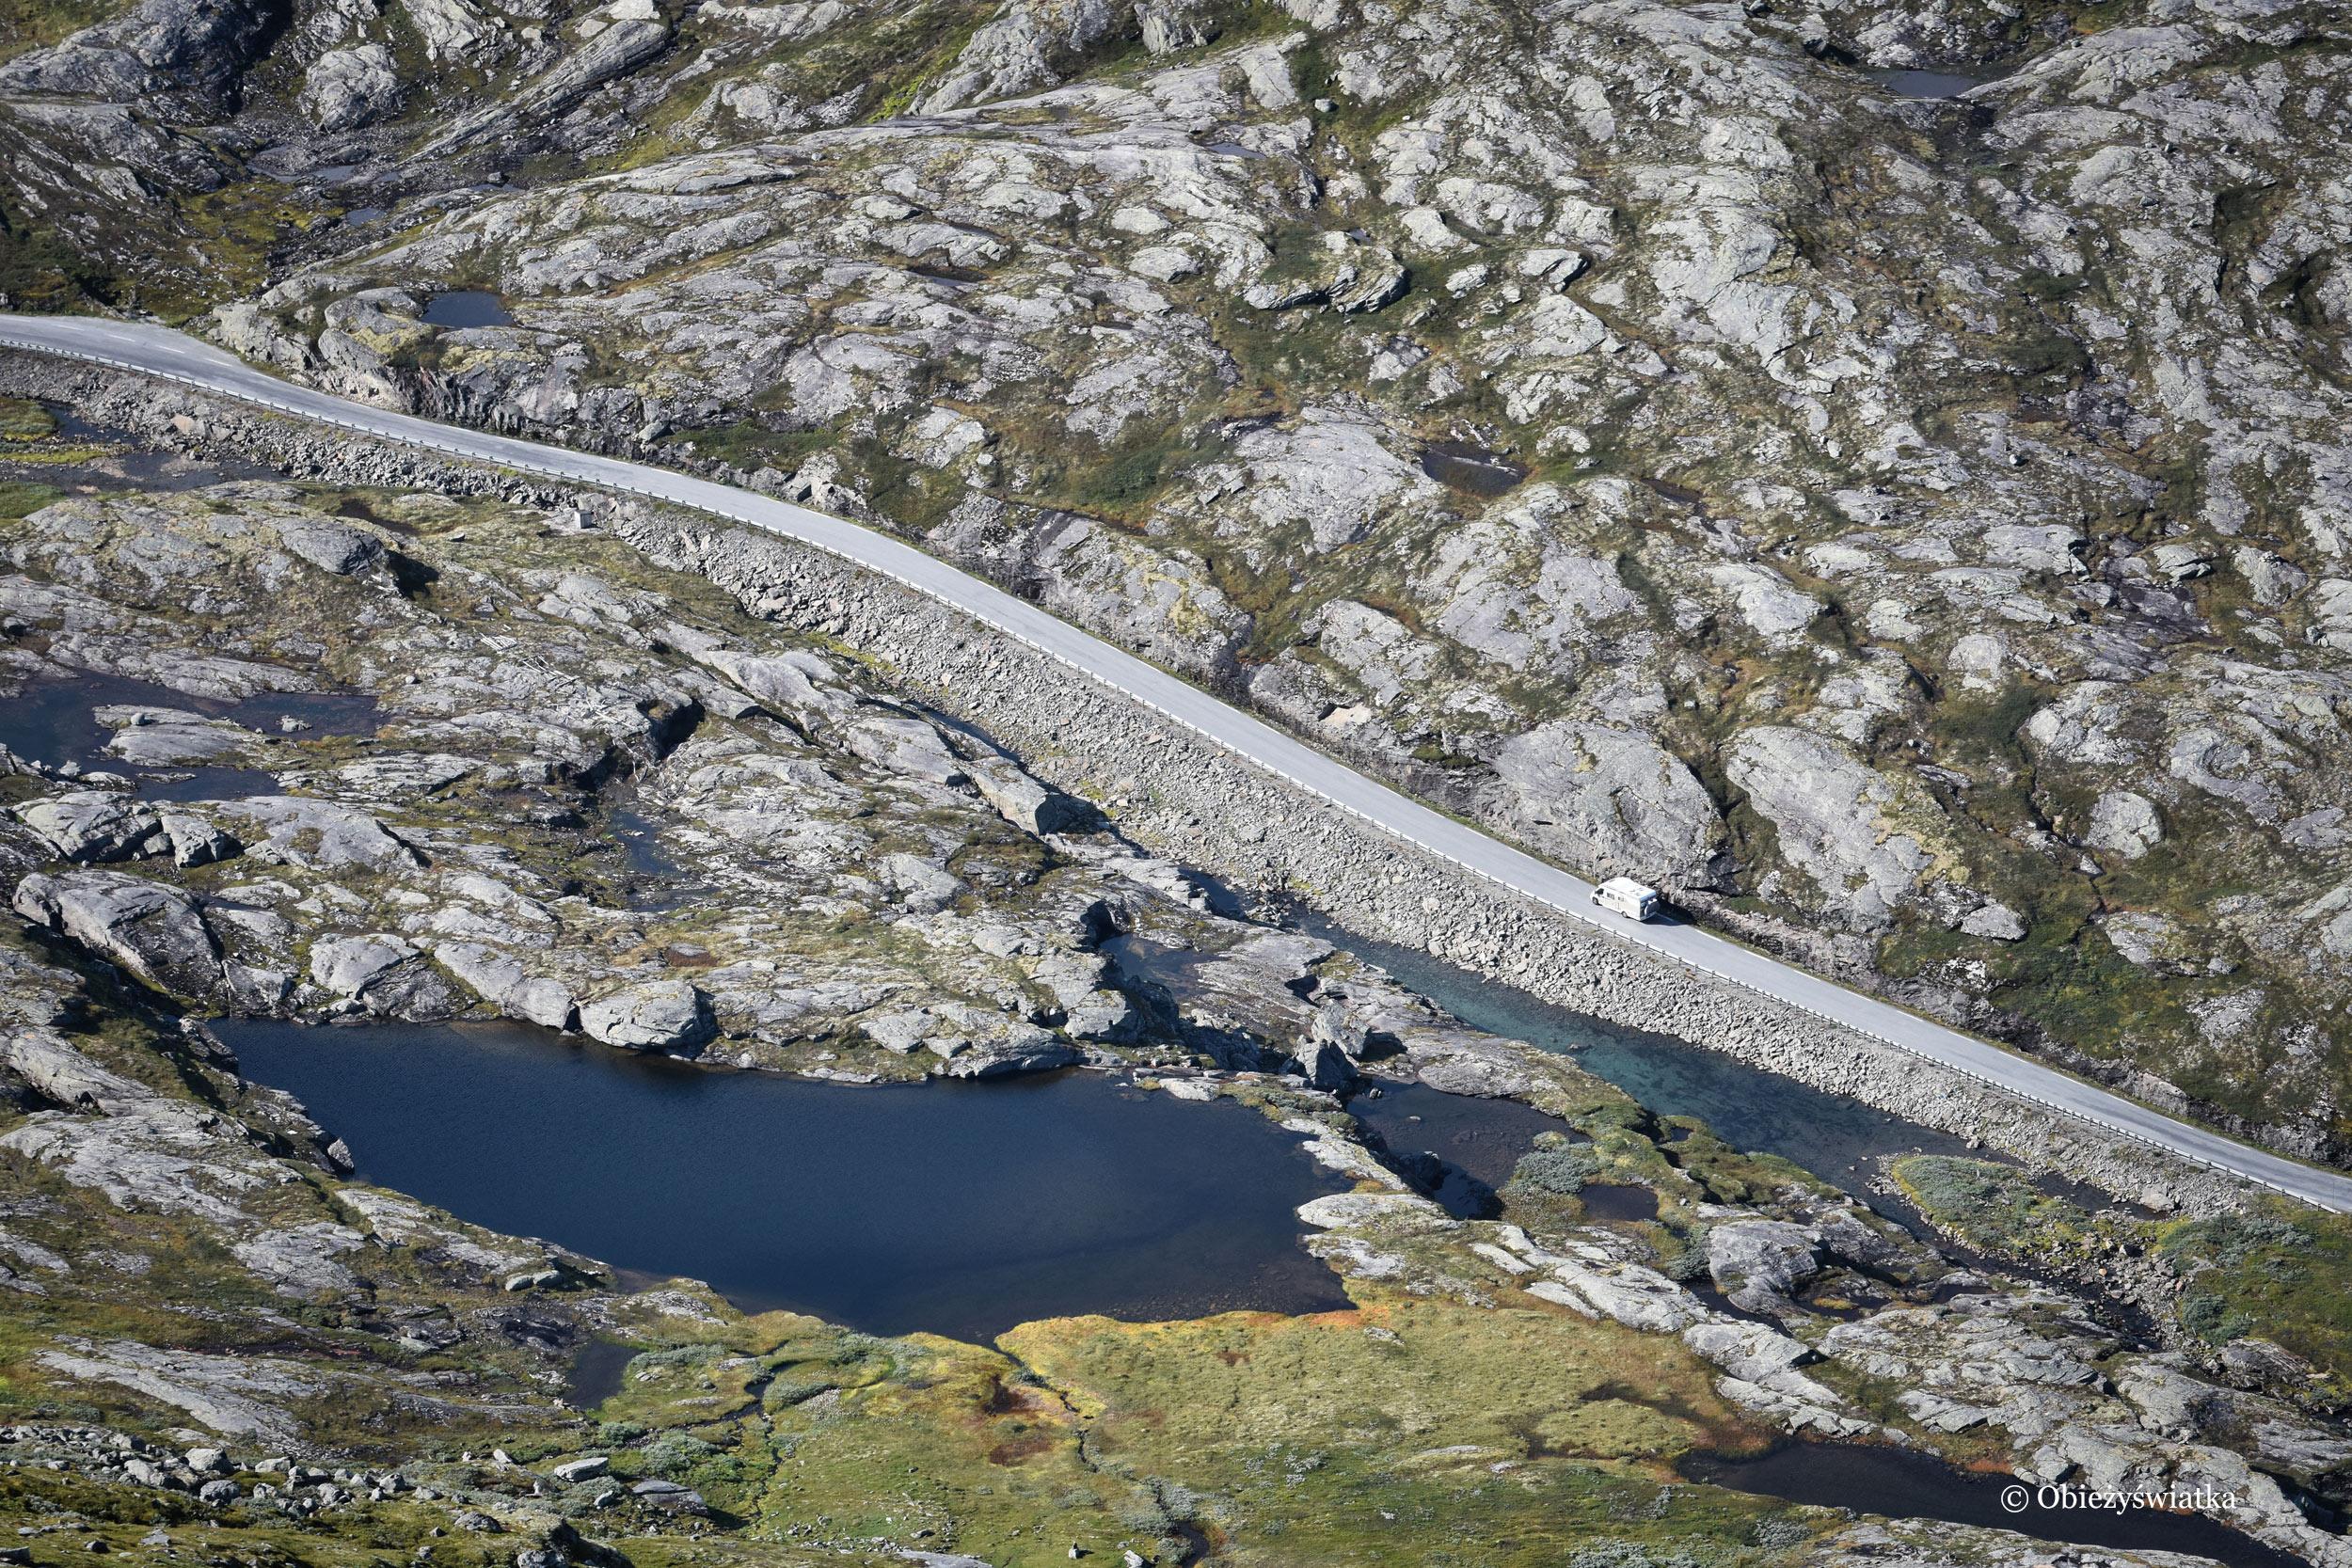 Niesamowity krajobraz norweski i kamper, Norwegia